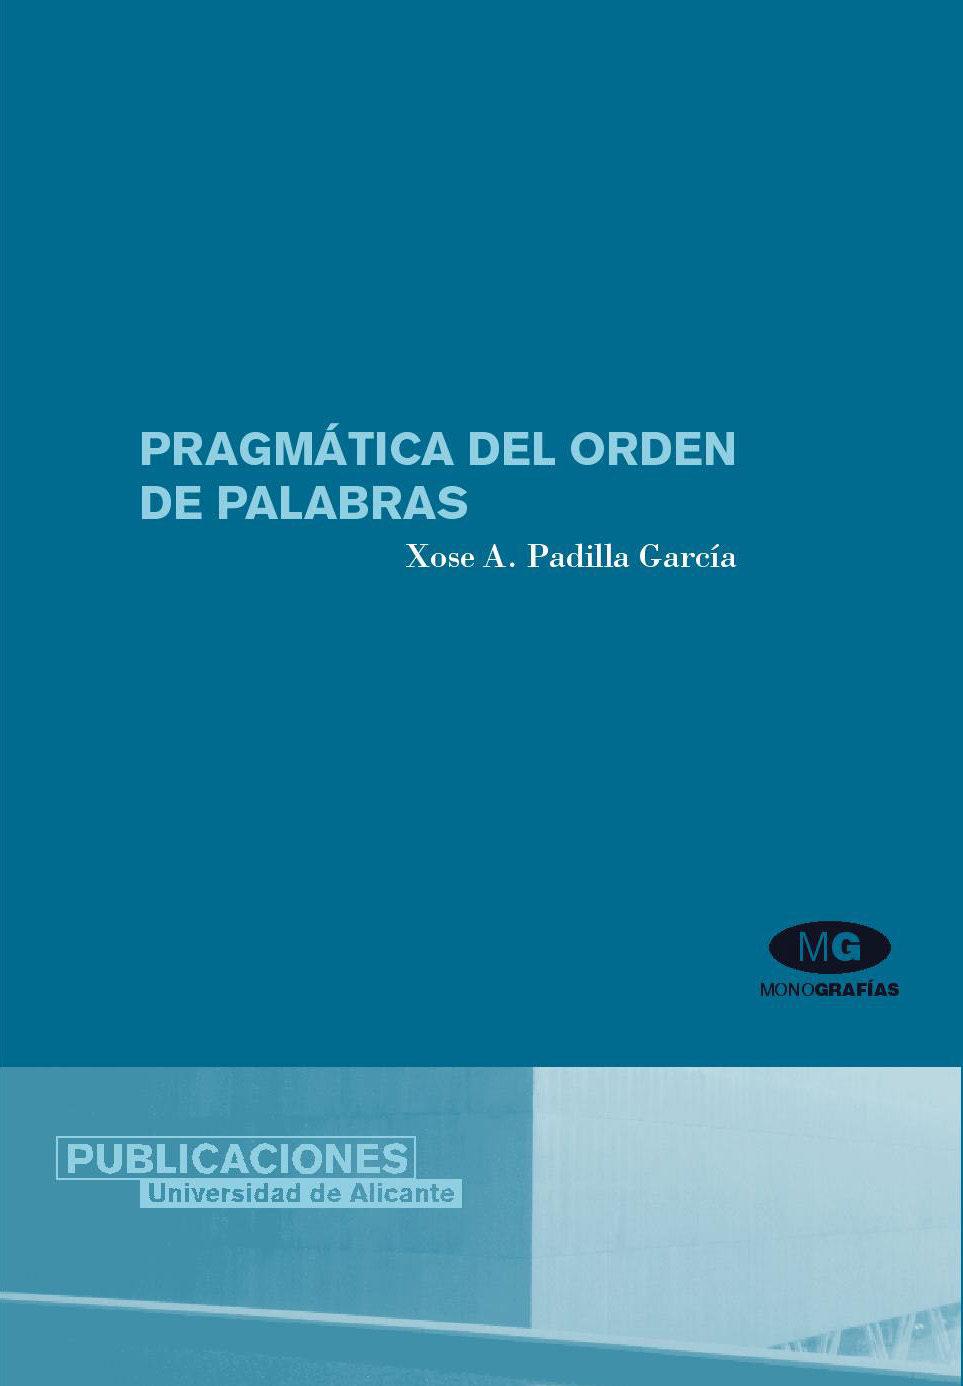 Pragmatica Del Orden De Palabras por Xose A. Padilla Garcia